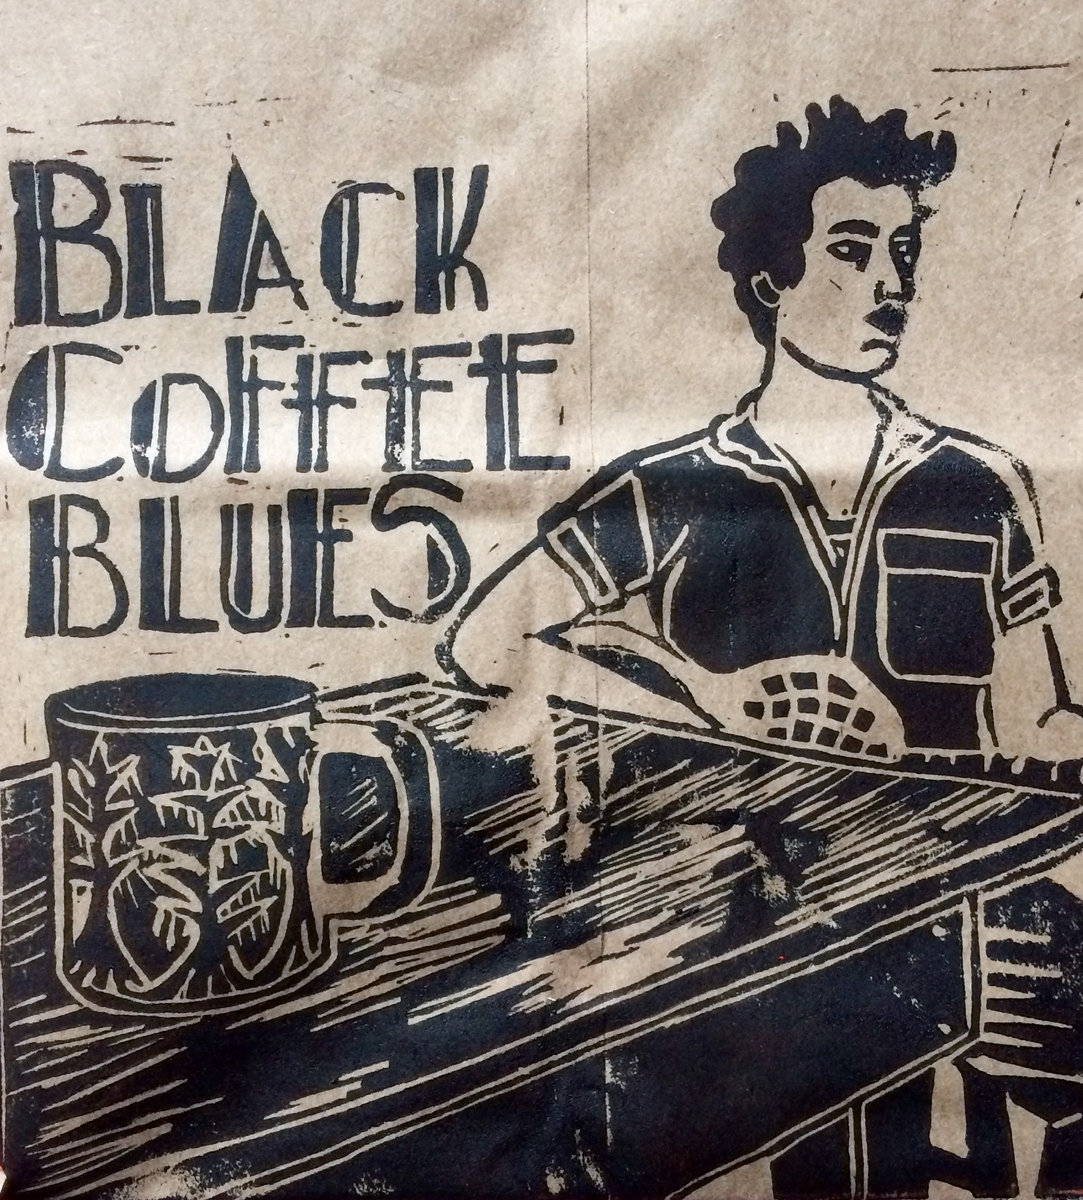 Black Coffee Blues d'Albanie Falletta